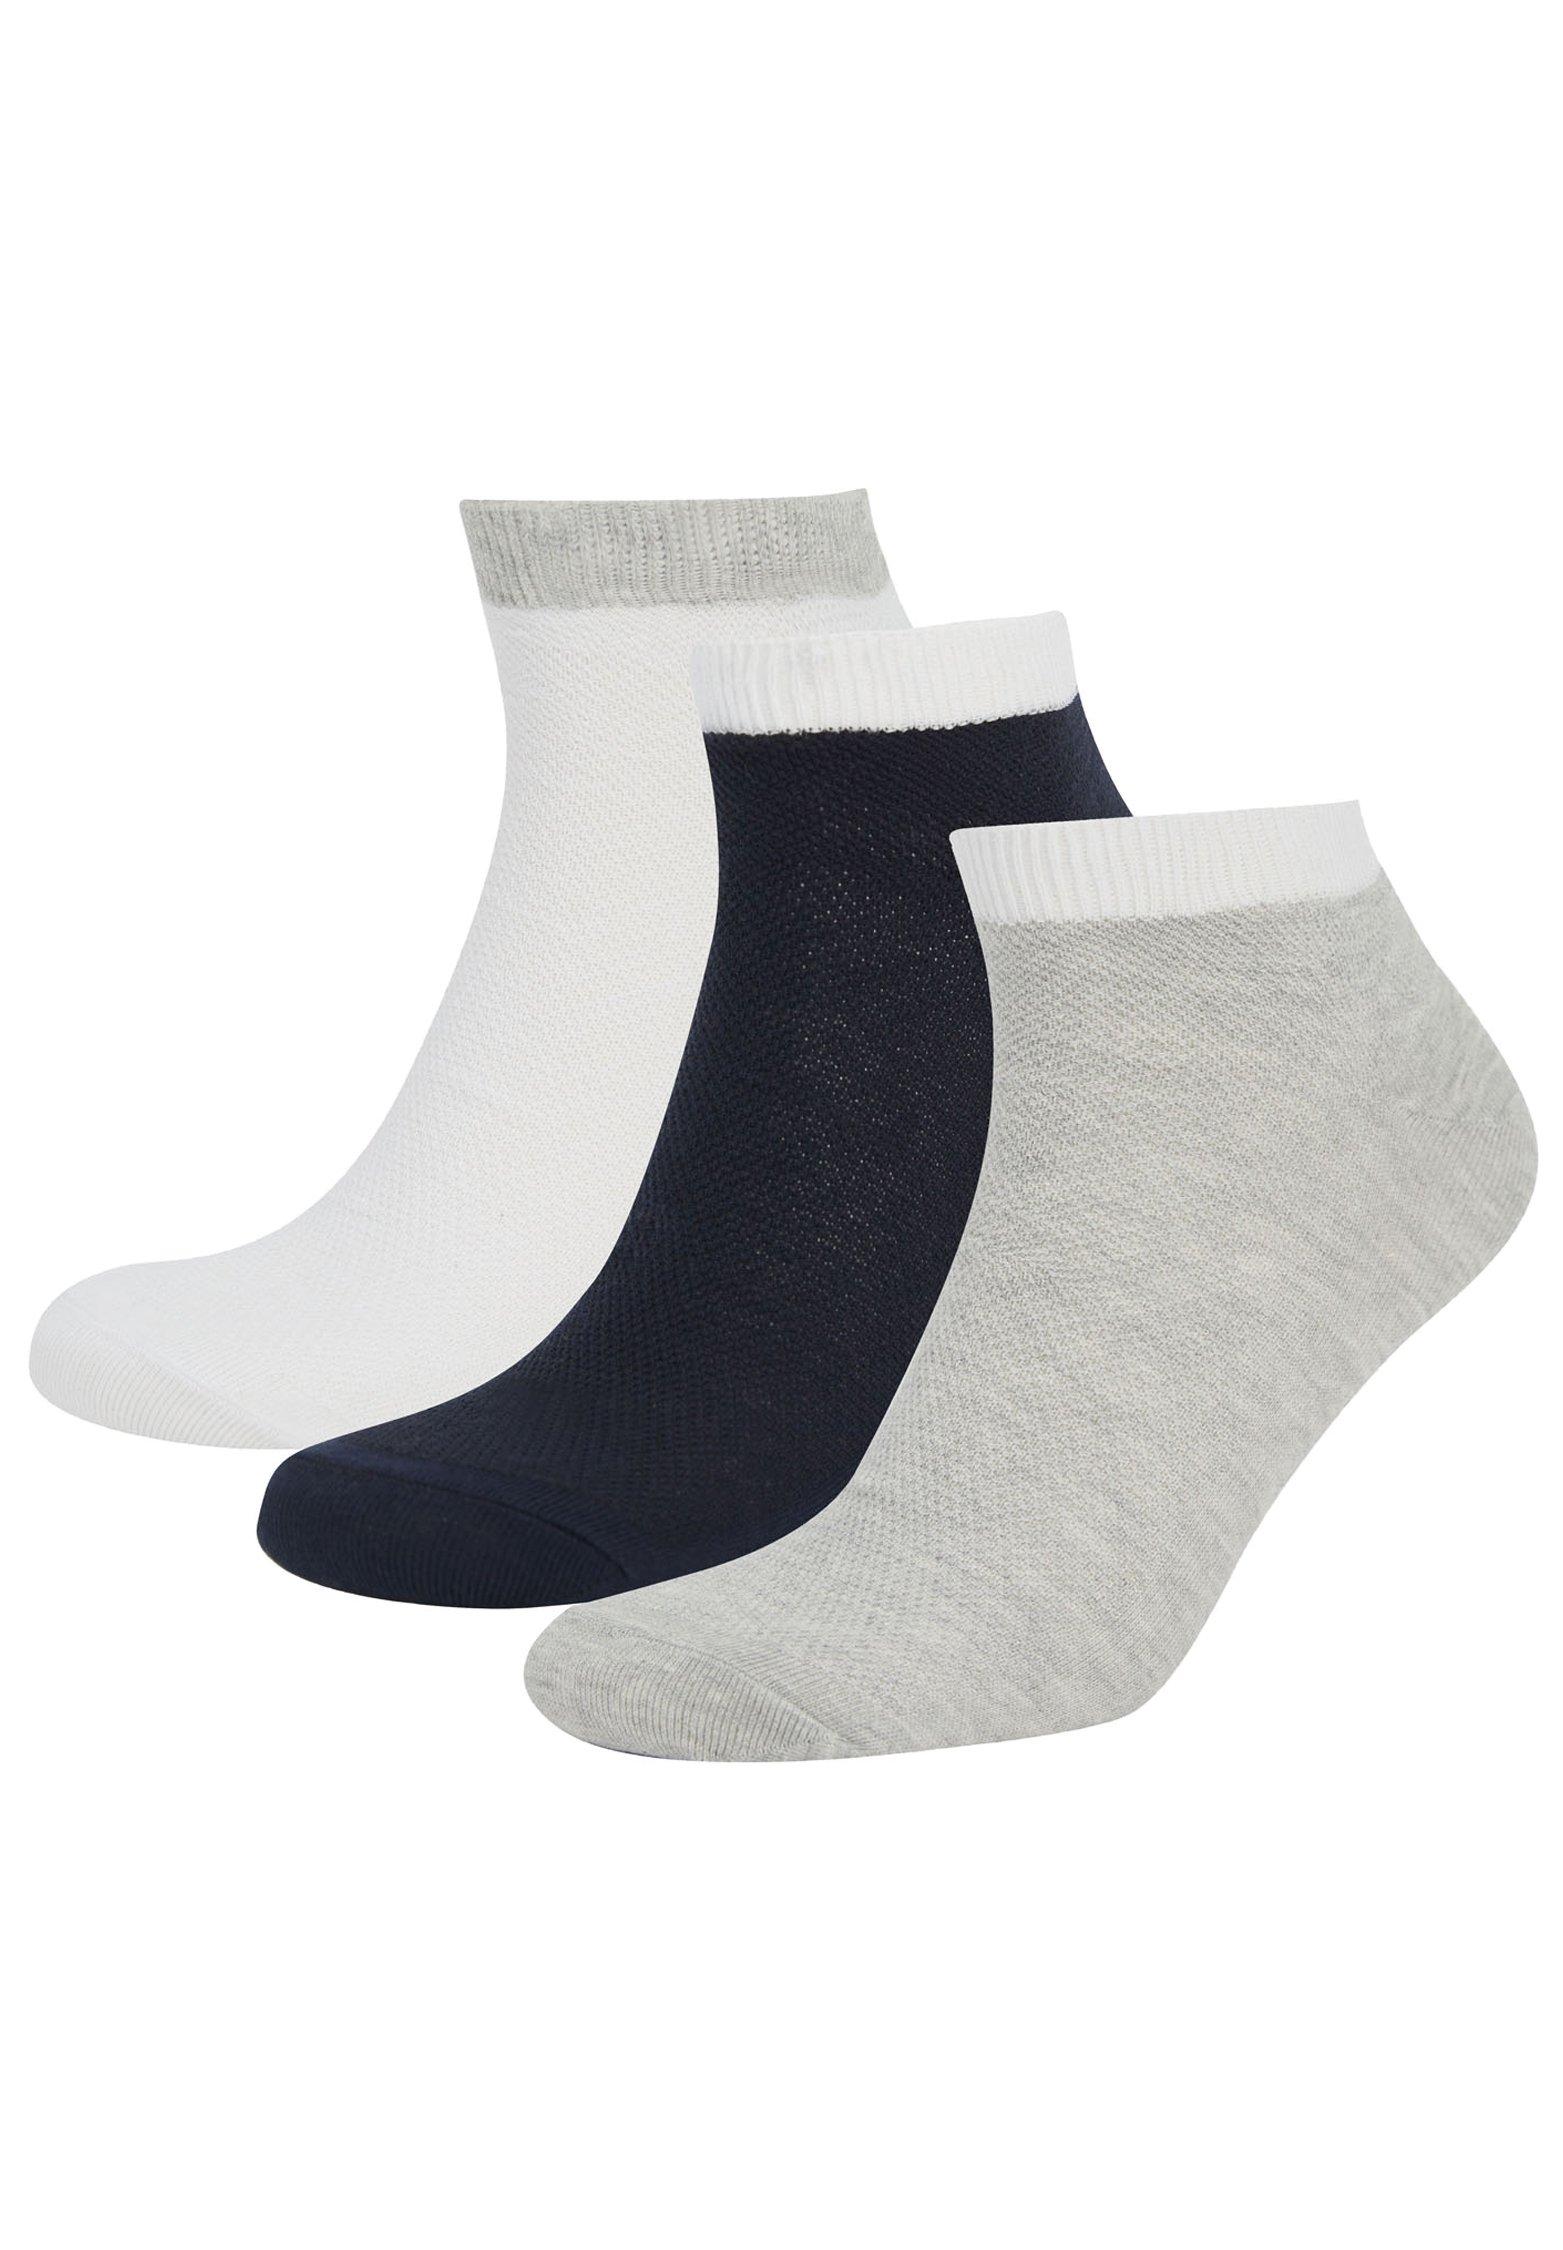 Hombre Calcetines